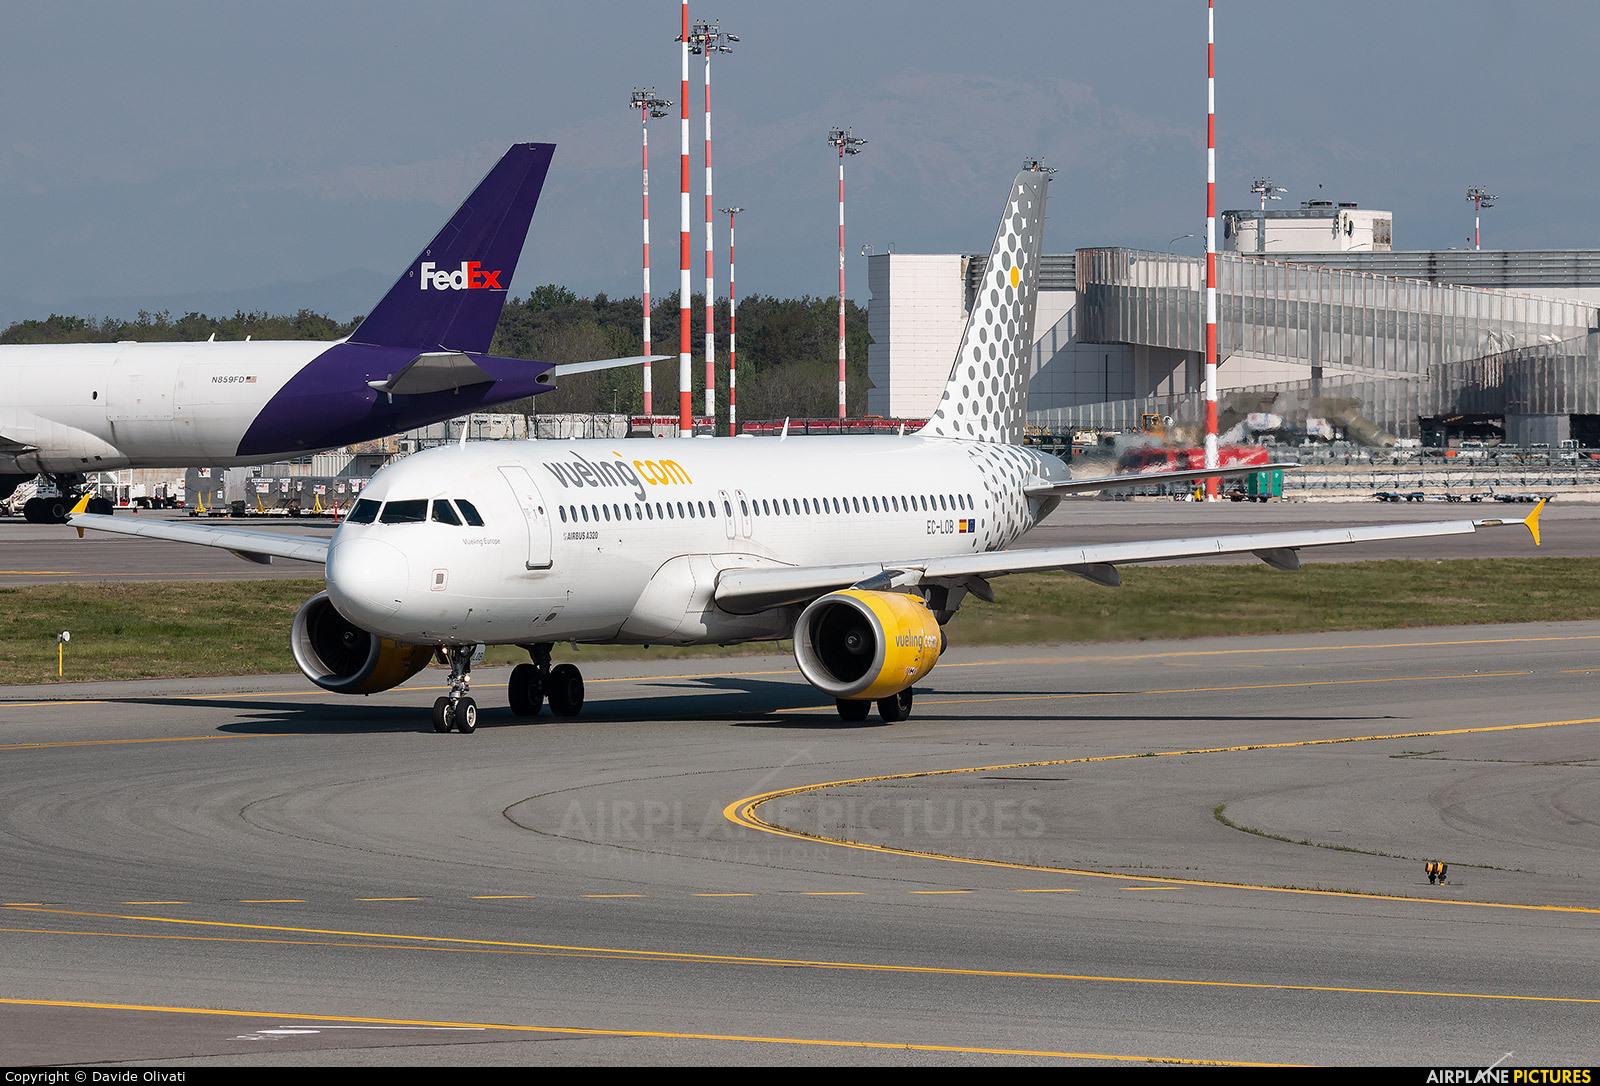 Vueling Airlines EC-LOB aircraft at Milan - Malpensa